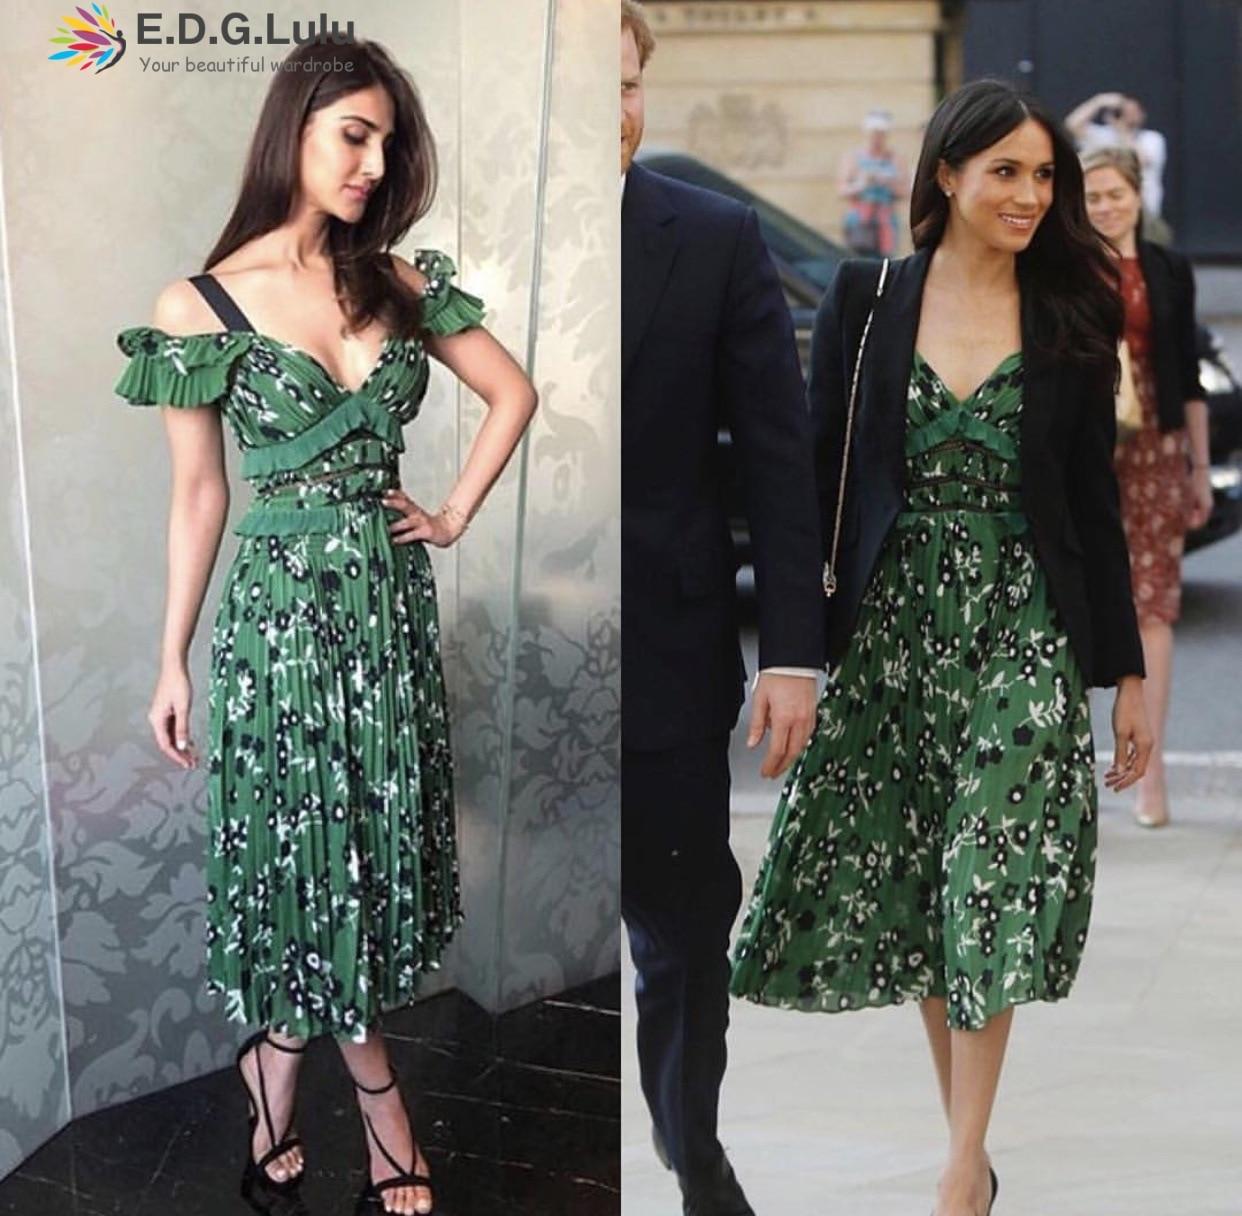 EDGLuLu Princess megan midi dress sexy elegant green floral print v neck 2018 women summer floral ruffle boho beach dress